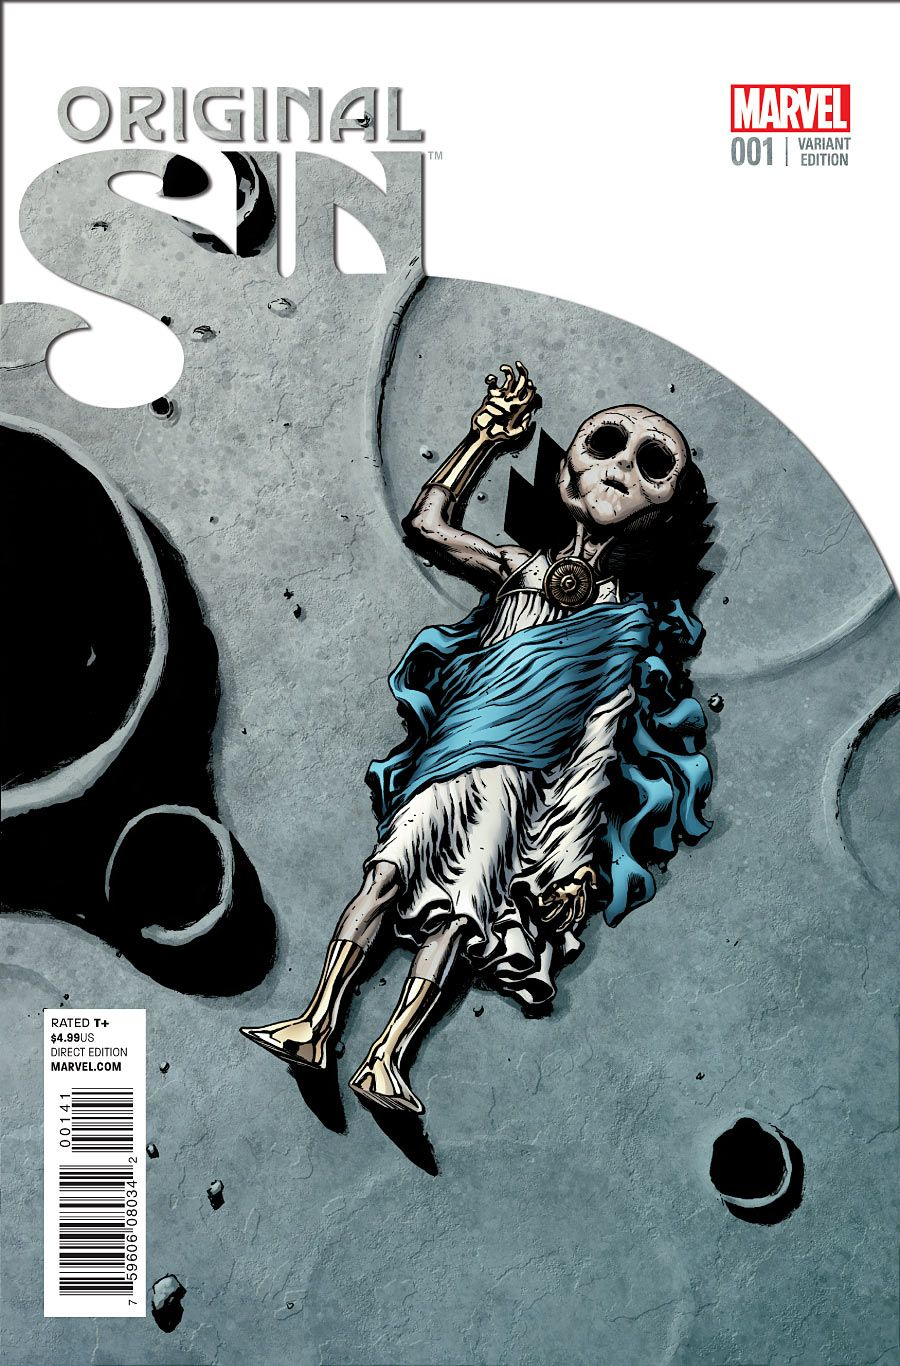 Original Sin Vol.1 #1 - The Watcher by Ed McGuinness *